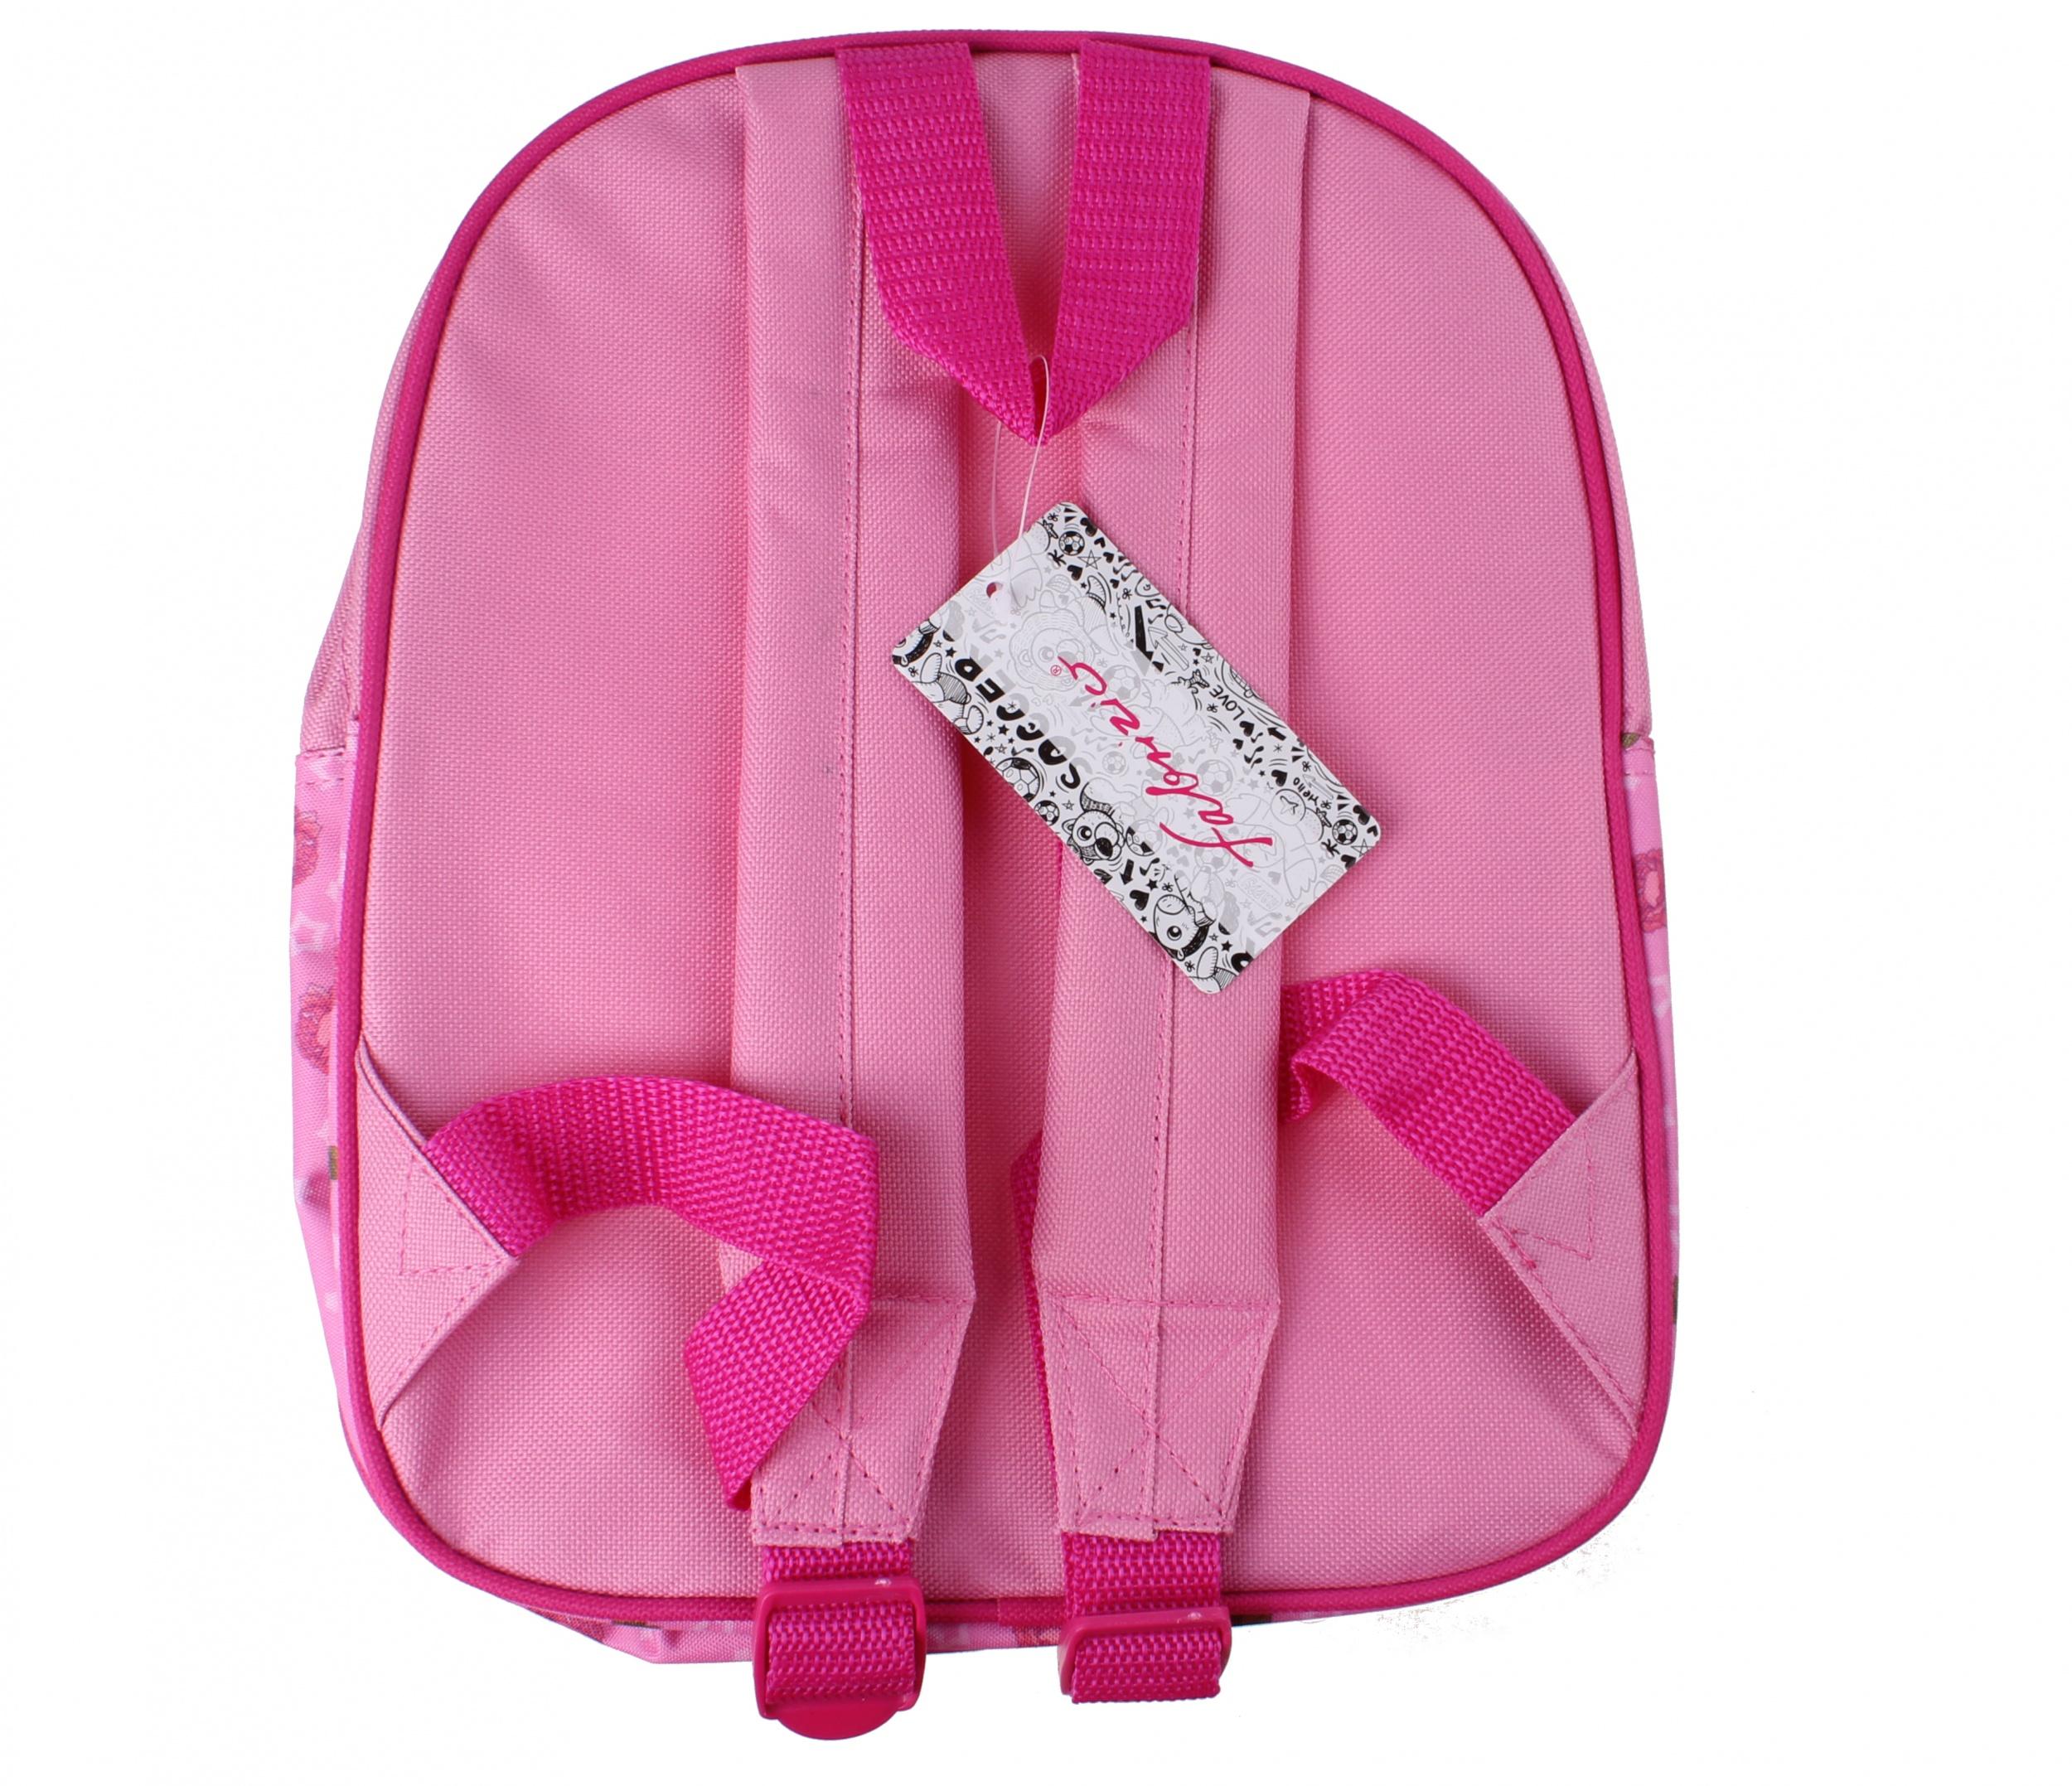 6a1789e9551 Fabrizio Prinsessen rugzak 4,5 liter roze - Internet-Toys